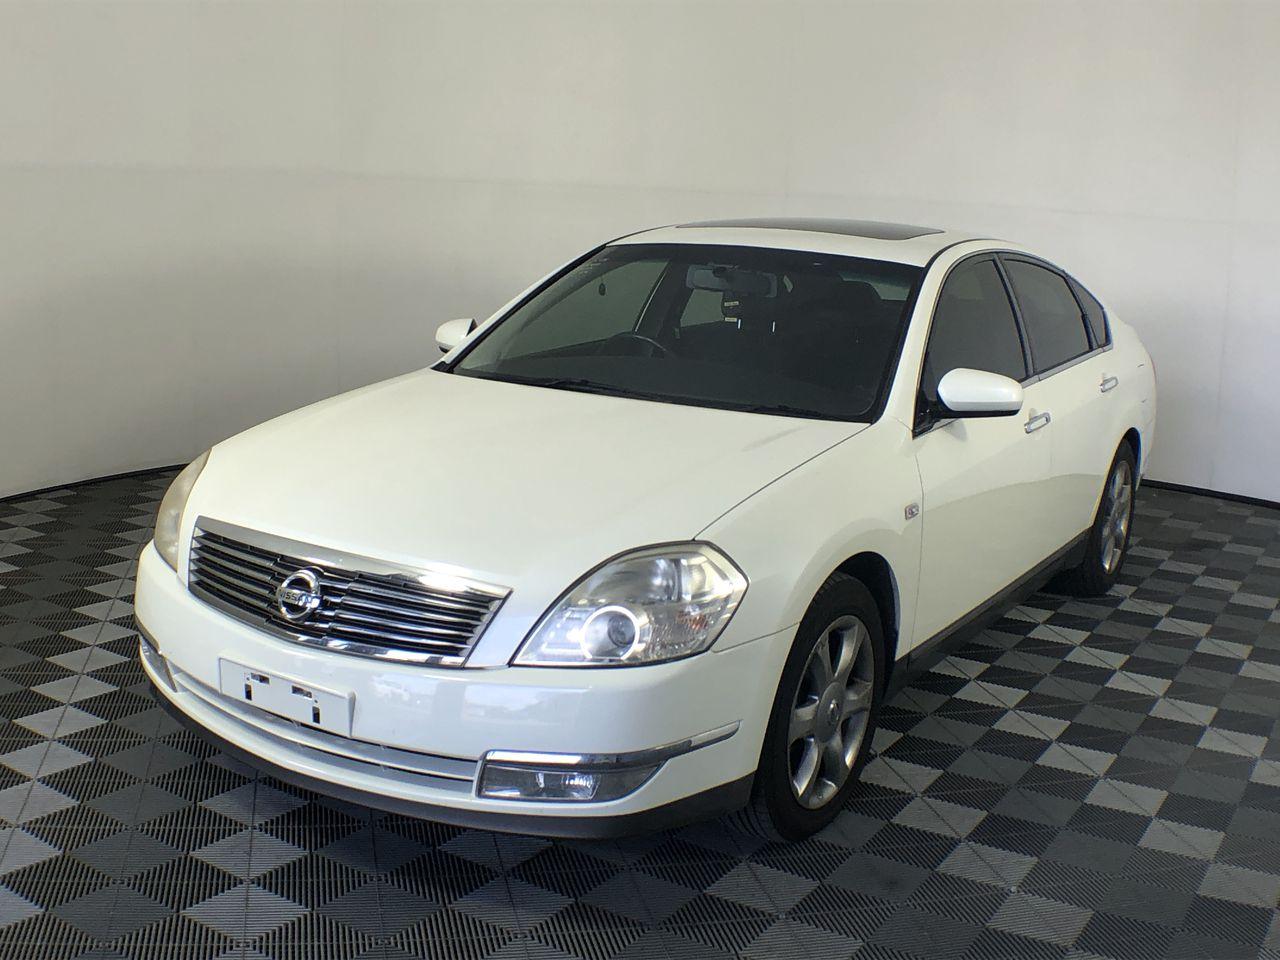 2007 Nissan Maxima Ti J31 Automatic Sedan